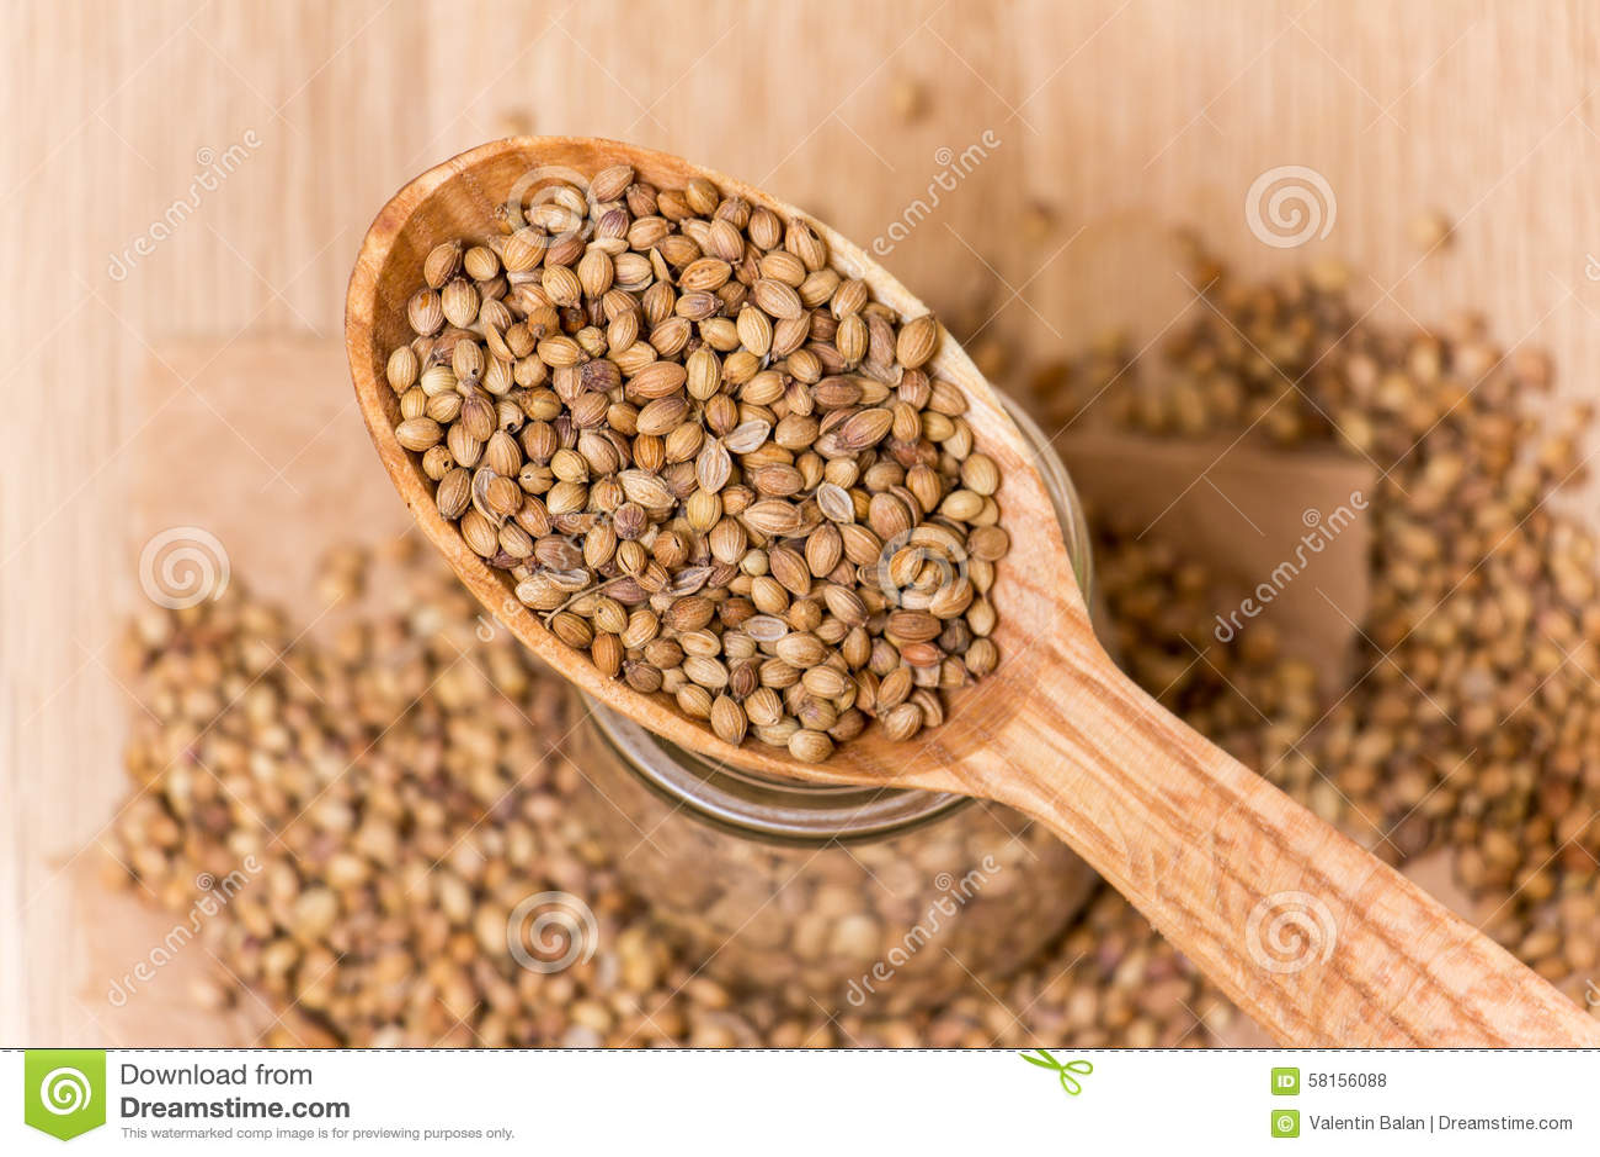 Coriander Seeds Stock Photo Image 58156088